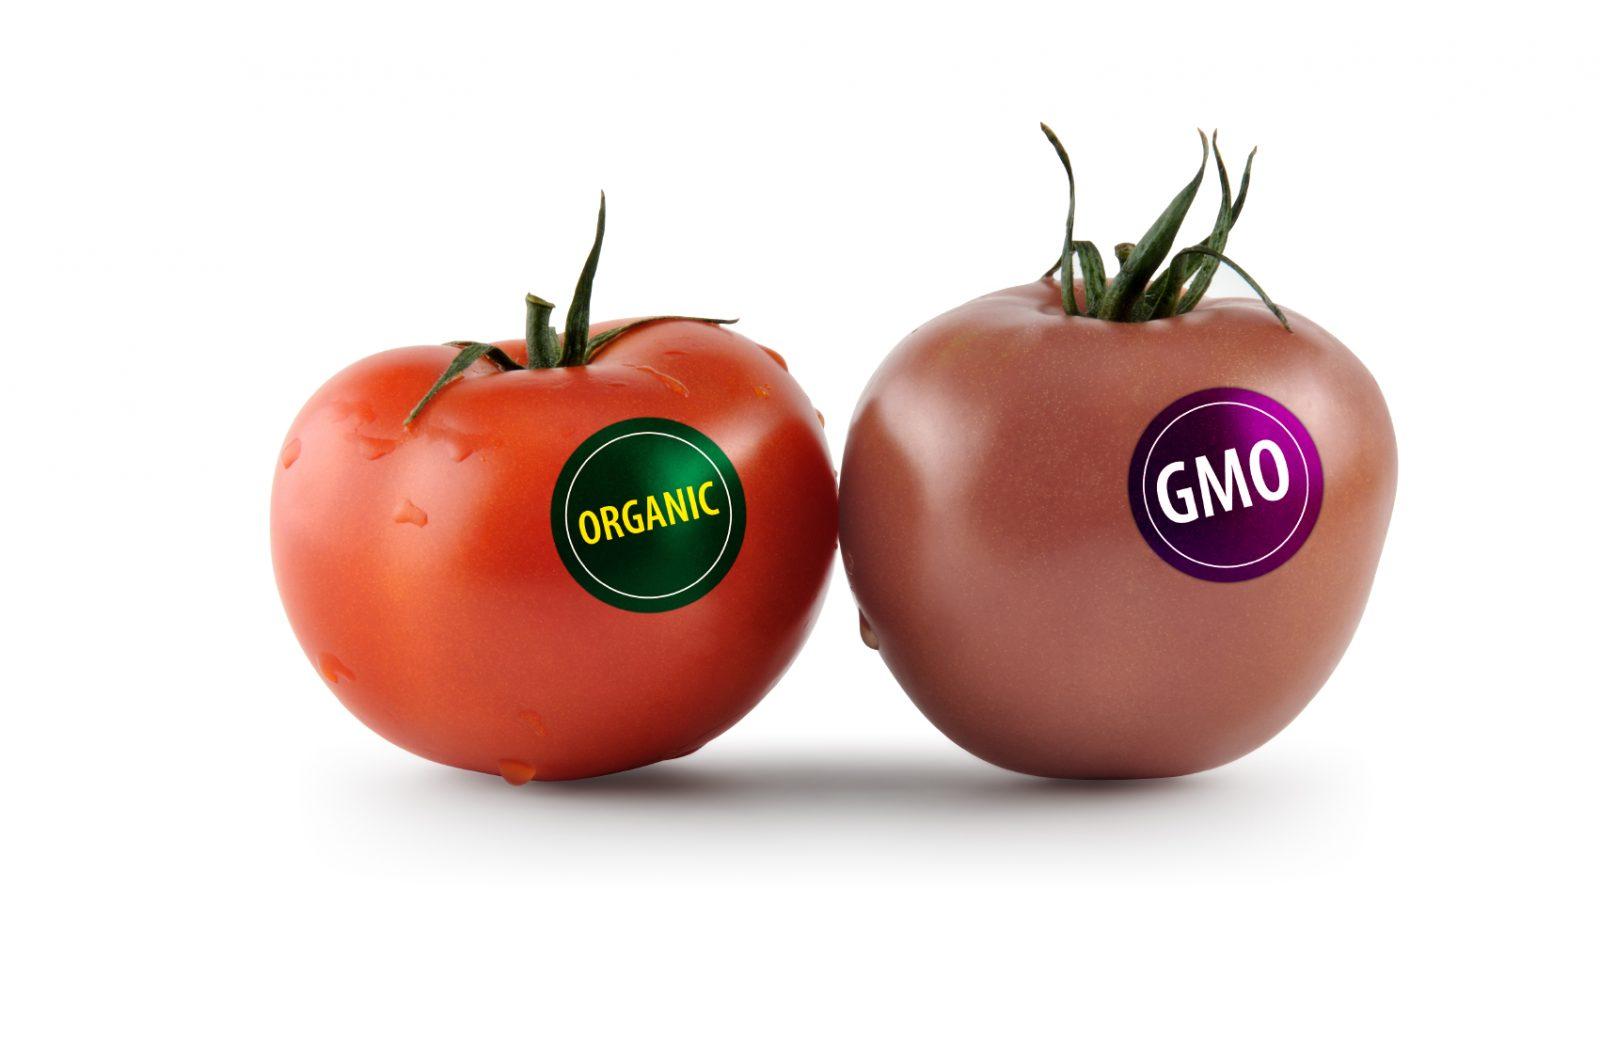 Kako razlikovati organsku od otrovne GMO hrane?